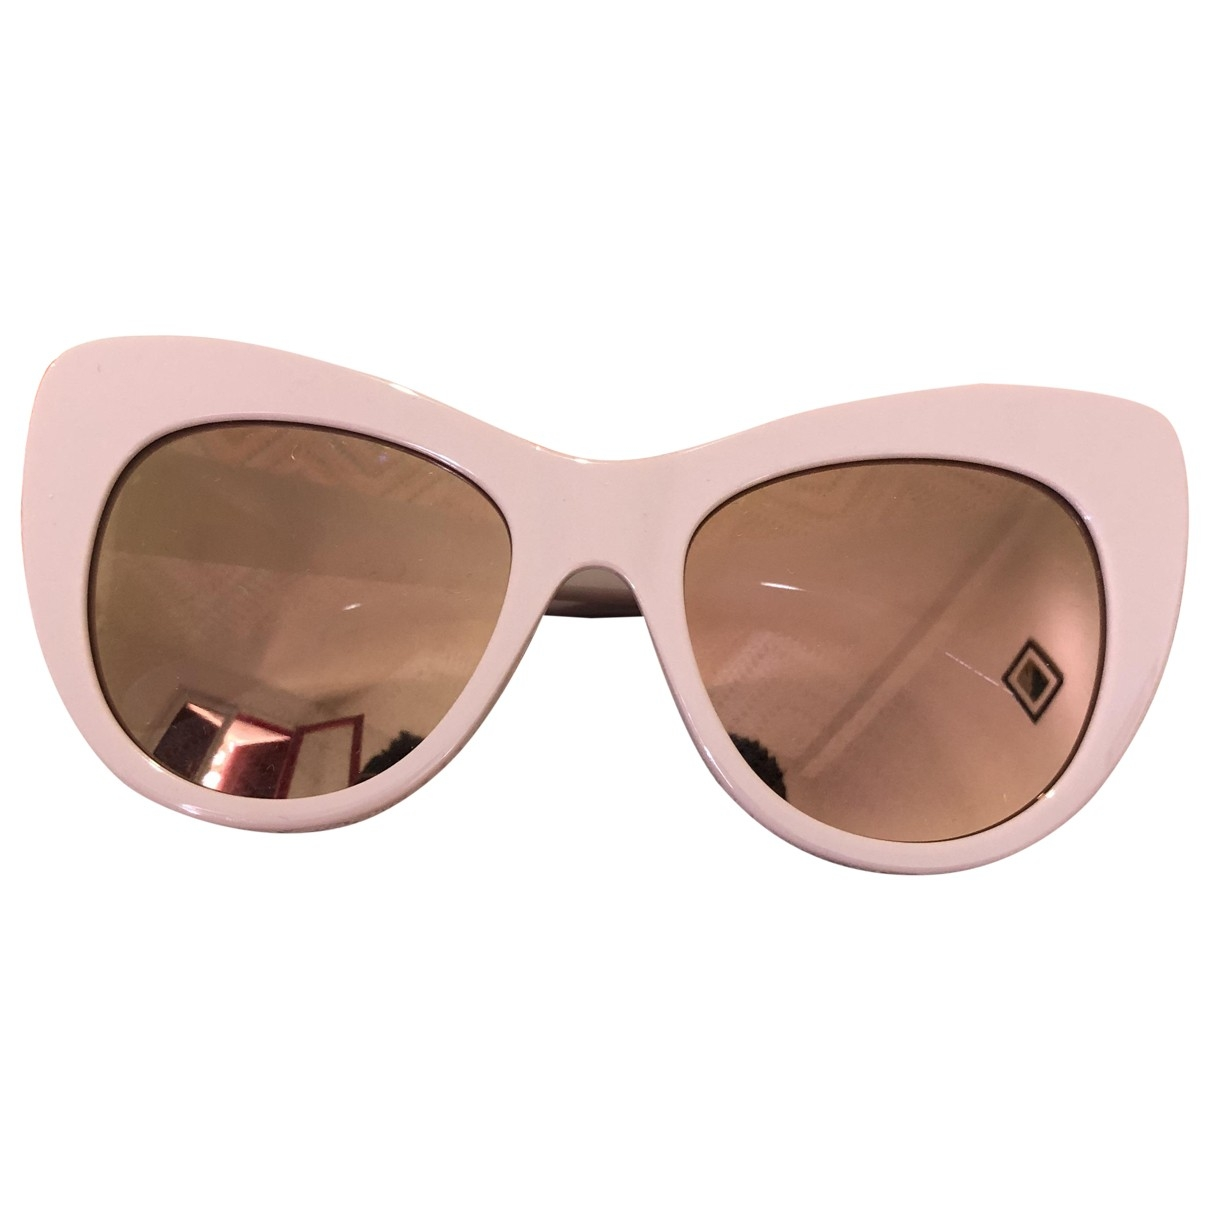 Stella Mccartney \N Pink Sunglasses for Women \N